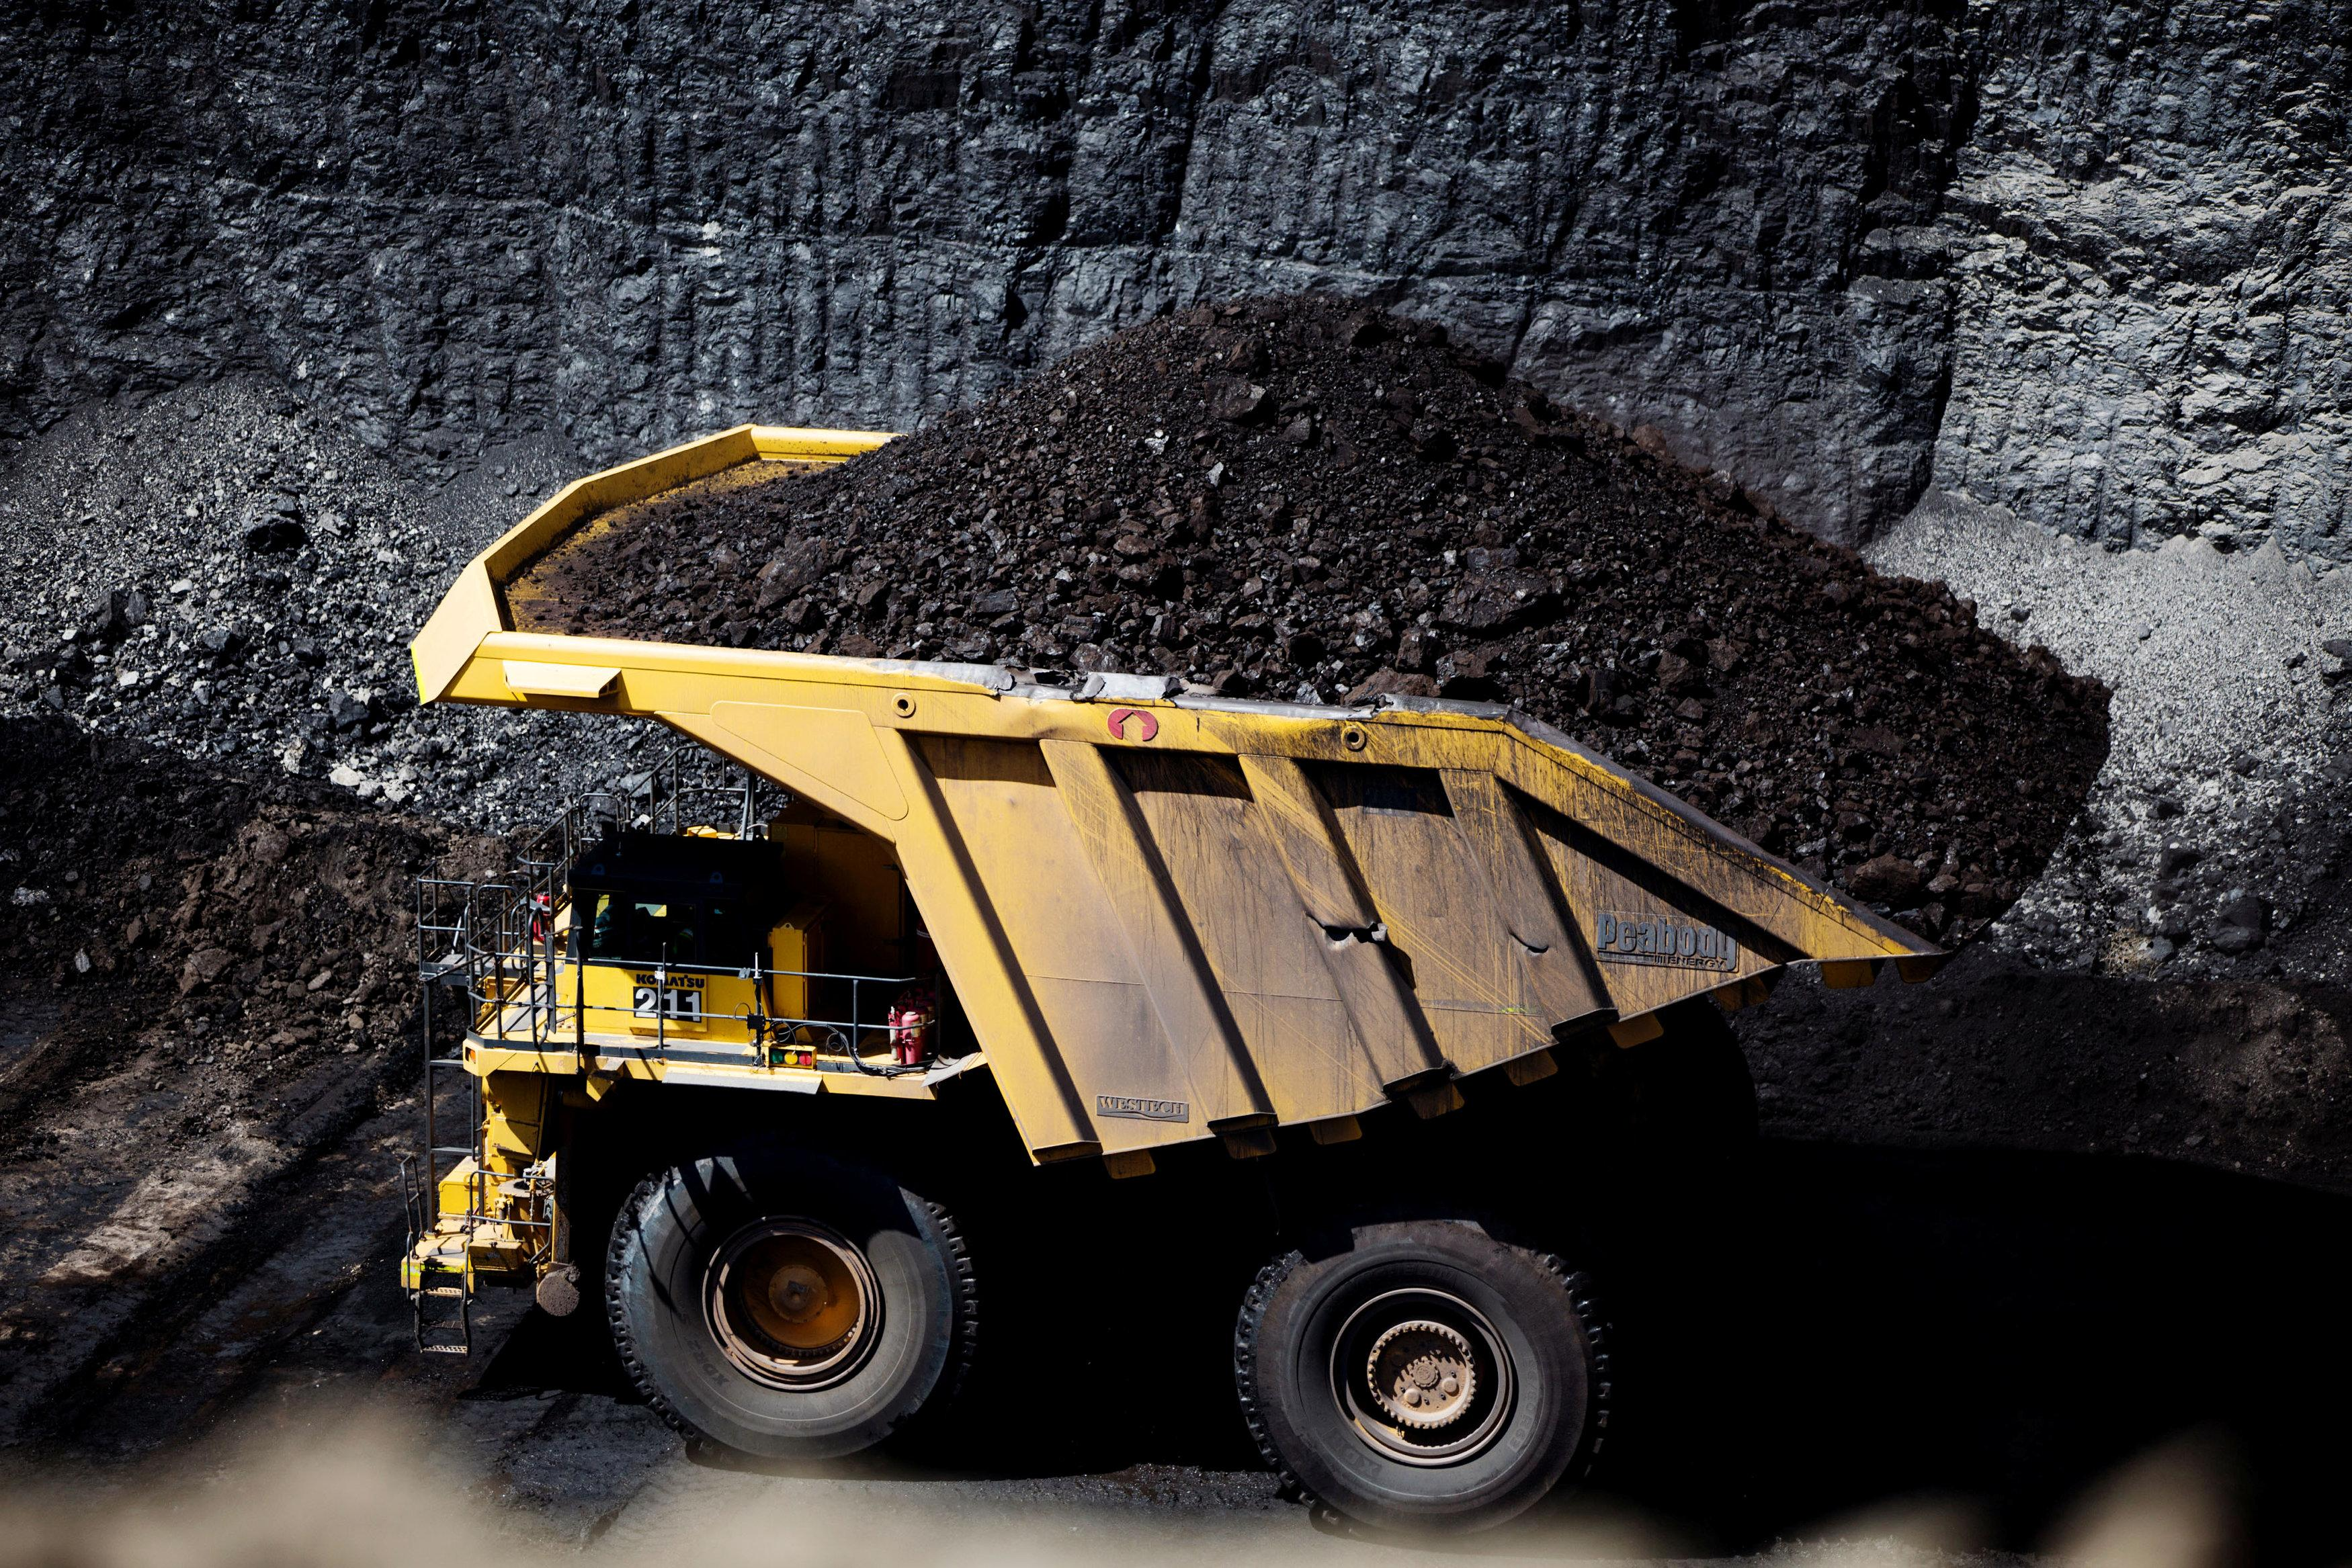 Haul trucks move coal at Peabody Energy's North Antelope Rochelle coal mine near Gillette, Wyoming, U.S. June 1, 2016. REUTERS/Kristina Barker